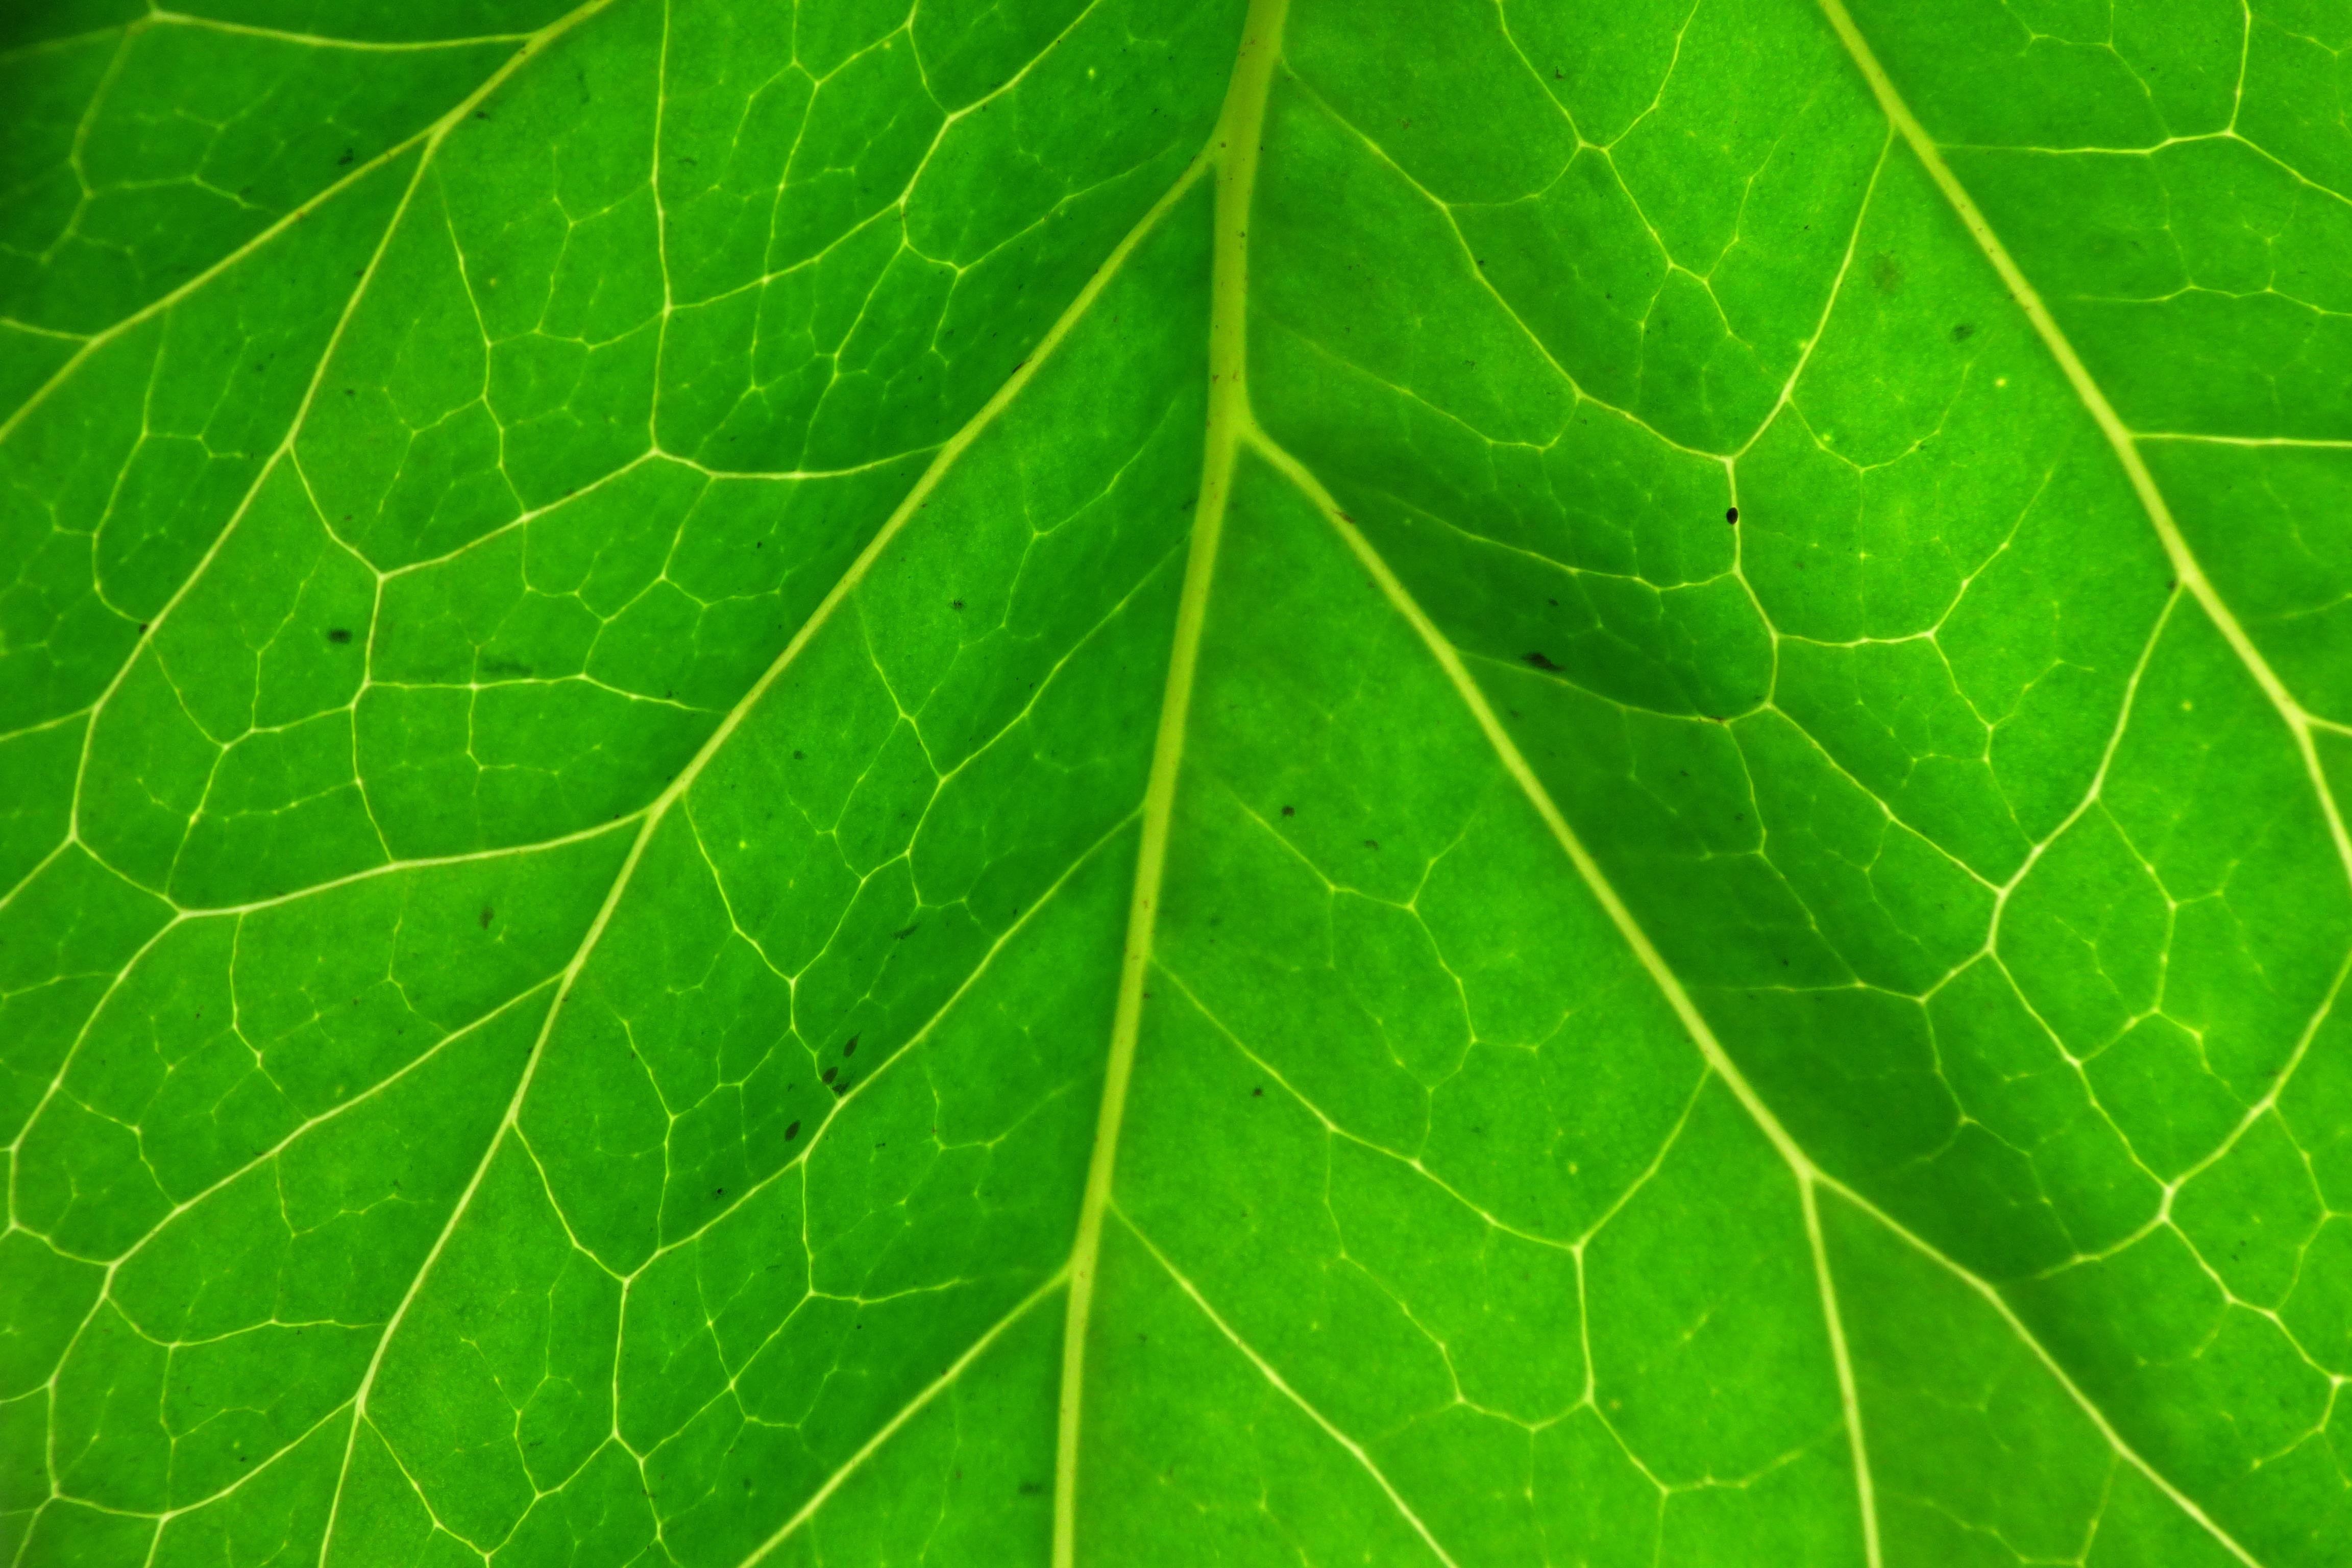 Fotos gratis naturaleza flor suelo venas iluminar for Papel pintado hojas verdes